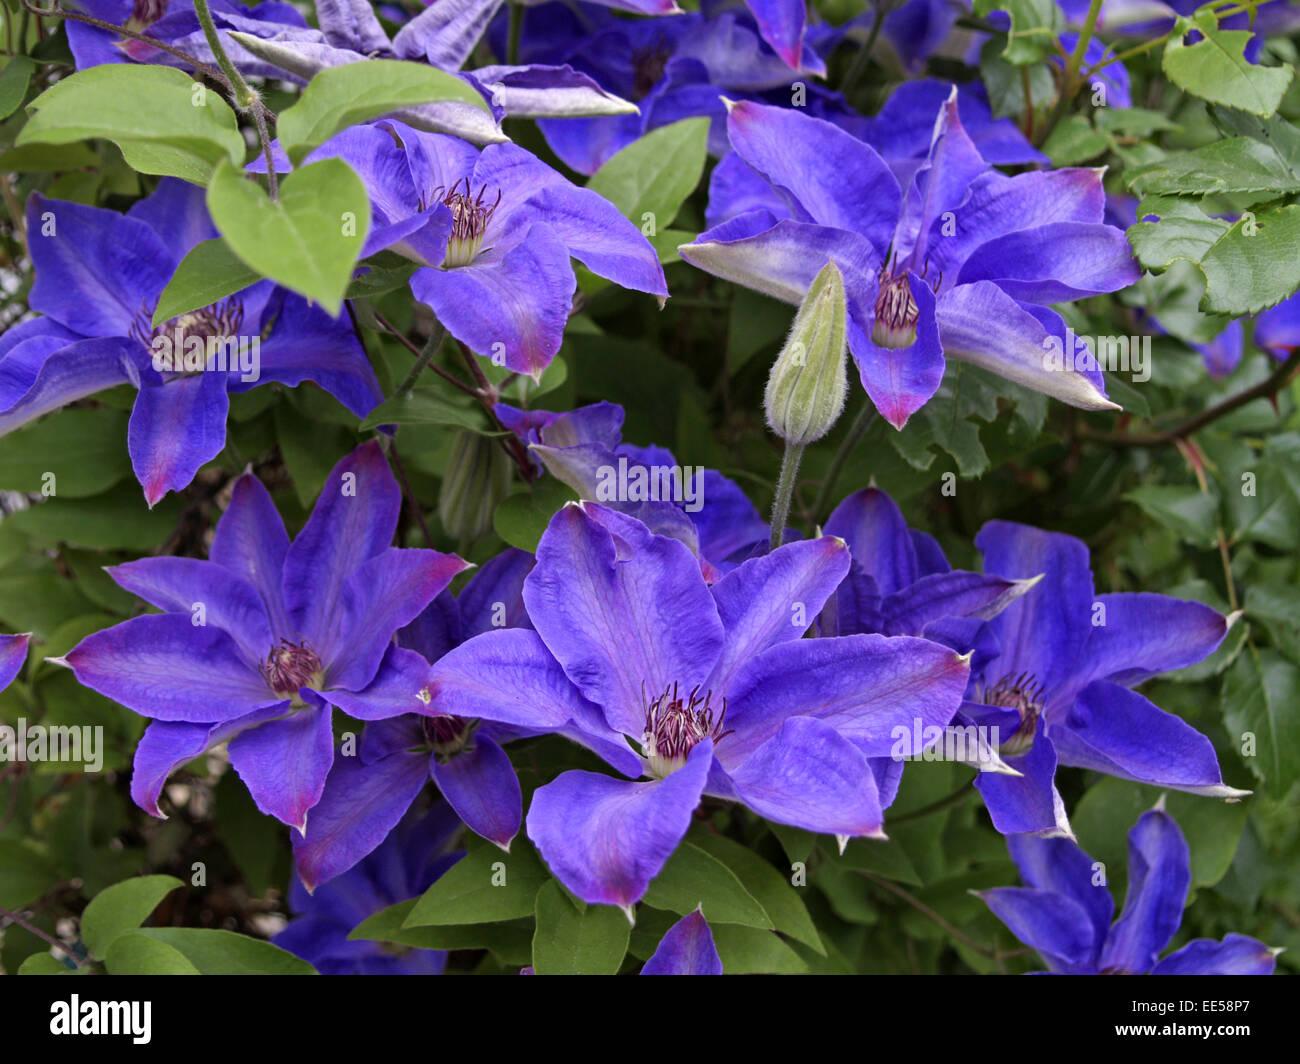 Kletterpflanze, Clematis, Blueten, violett, Natur, Vegetation, Botanik, Pflanzenwelt, Pflanze, Blume, bluehen, lila, - Stock Image